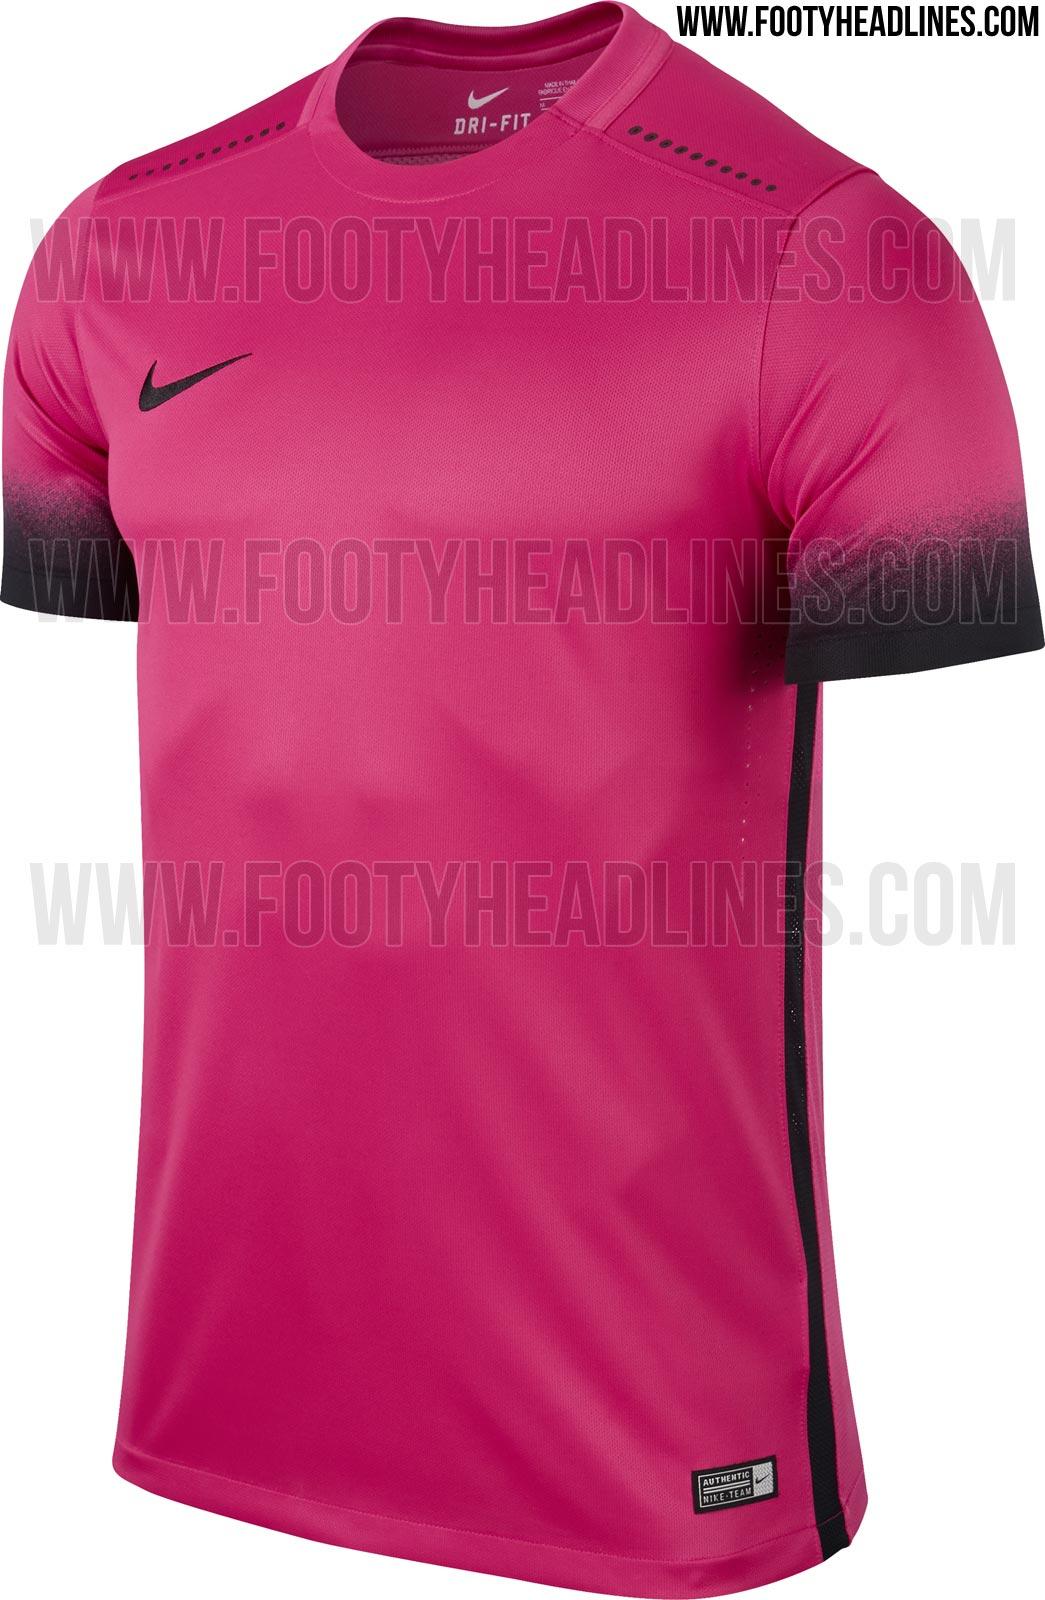 Nike US 2016-17 Teamwear Kits Leaked - Footy Headlines